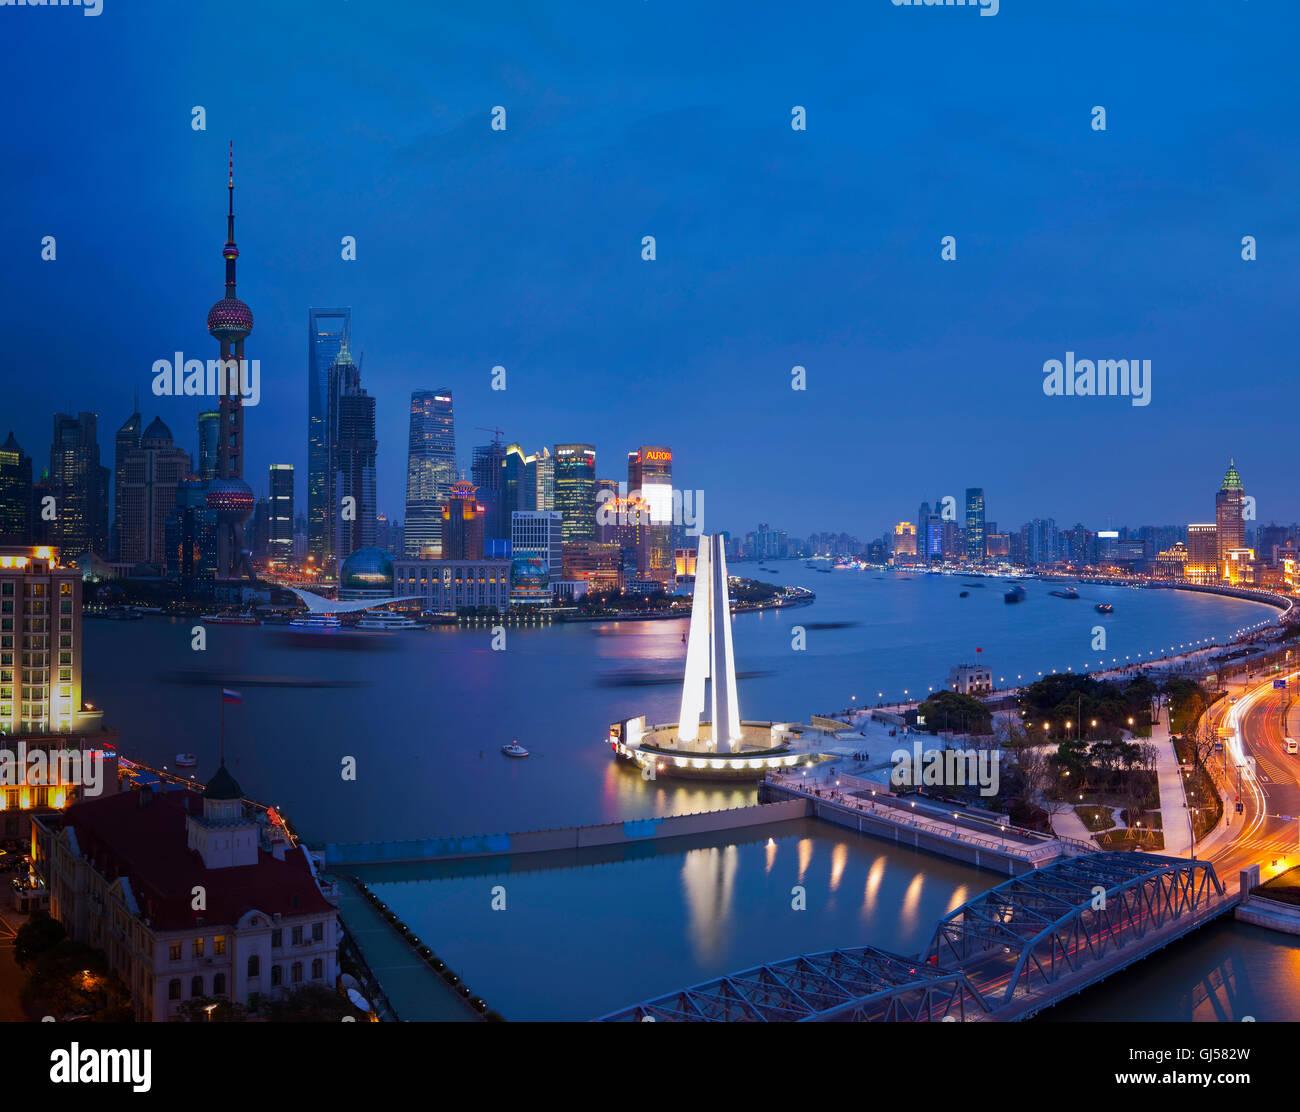 Shanghai Bund - Stock Image